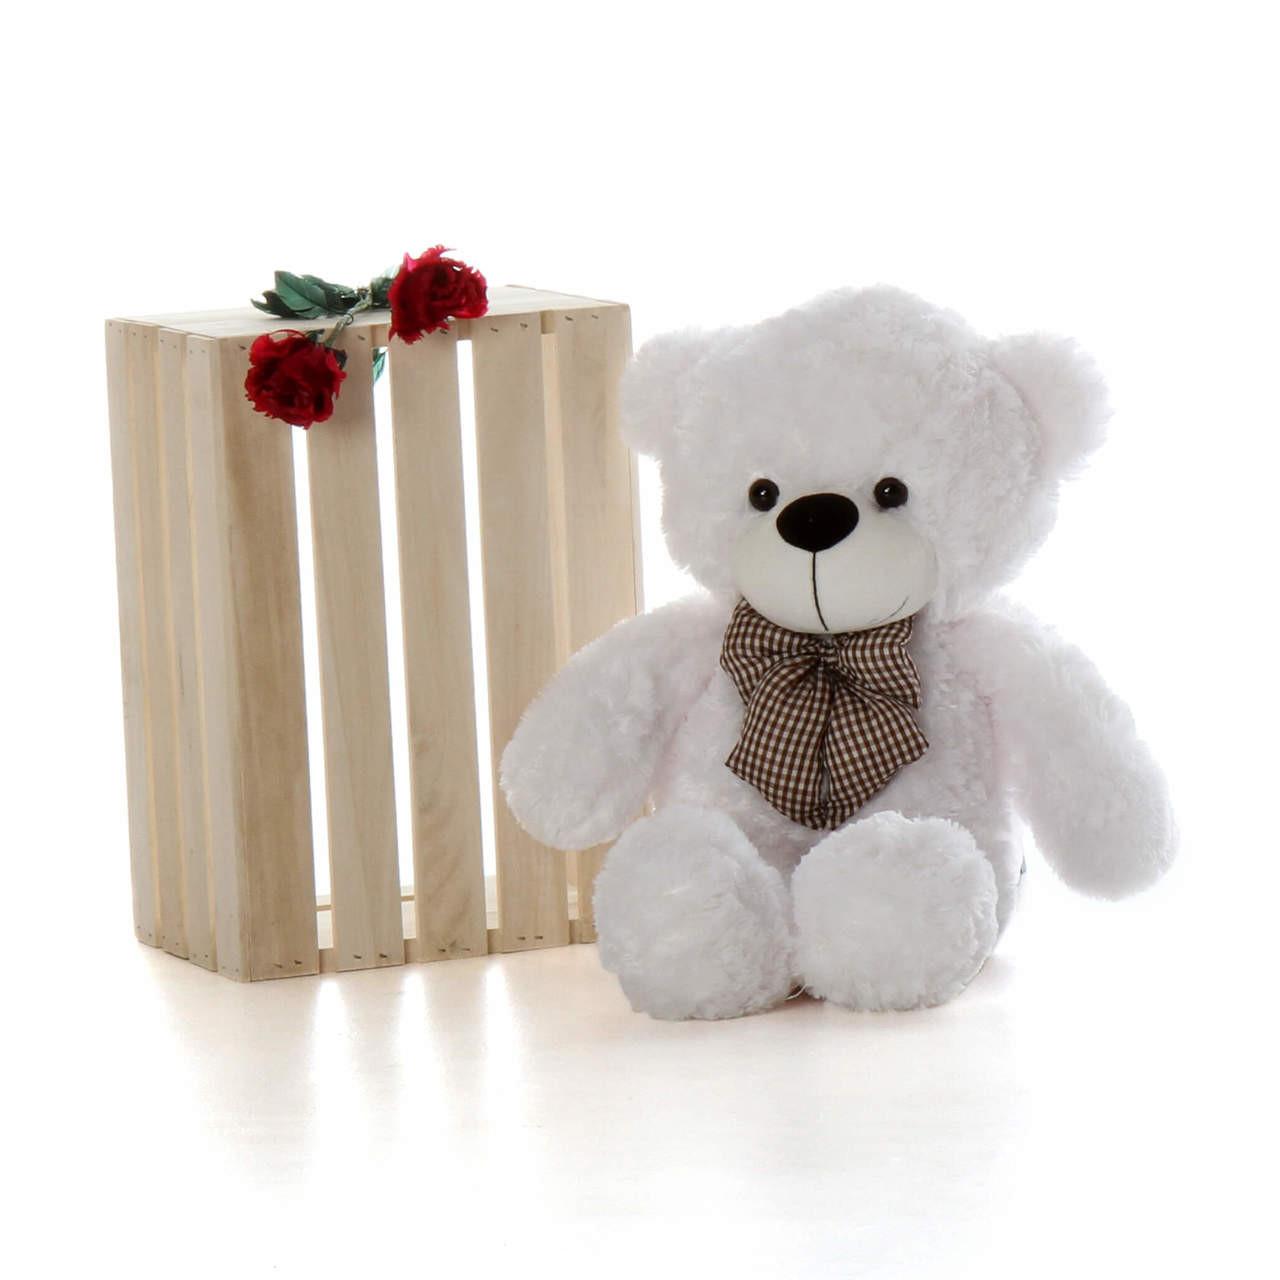 30in huggable heavenly soft fur oversized white teddy bear Coco Cuddles